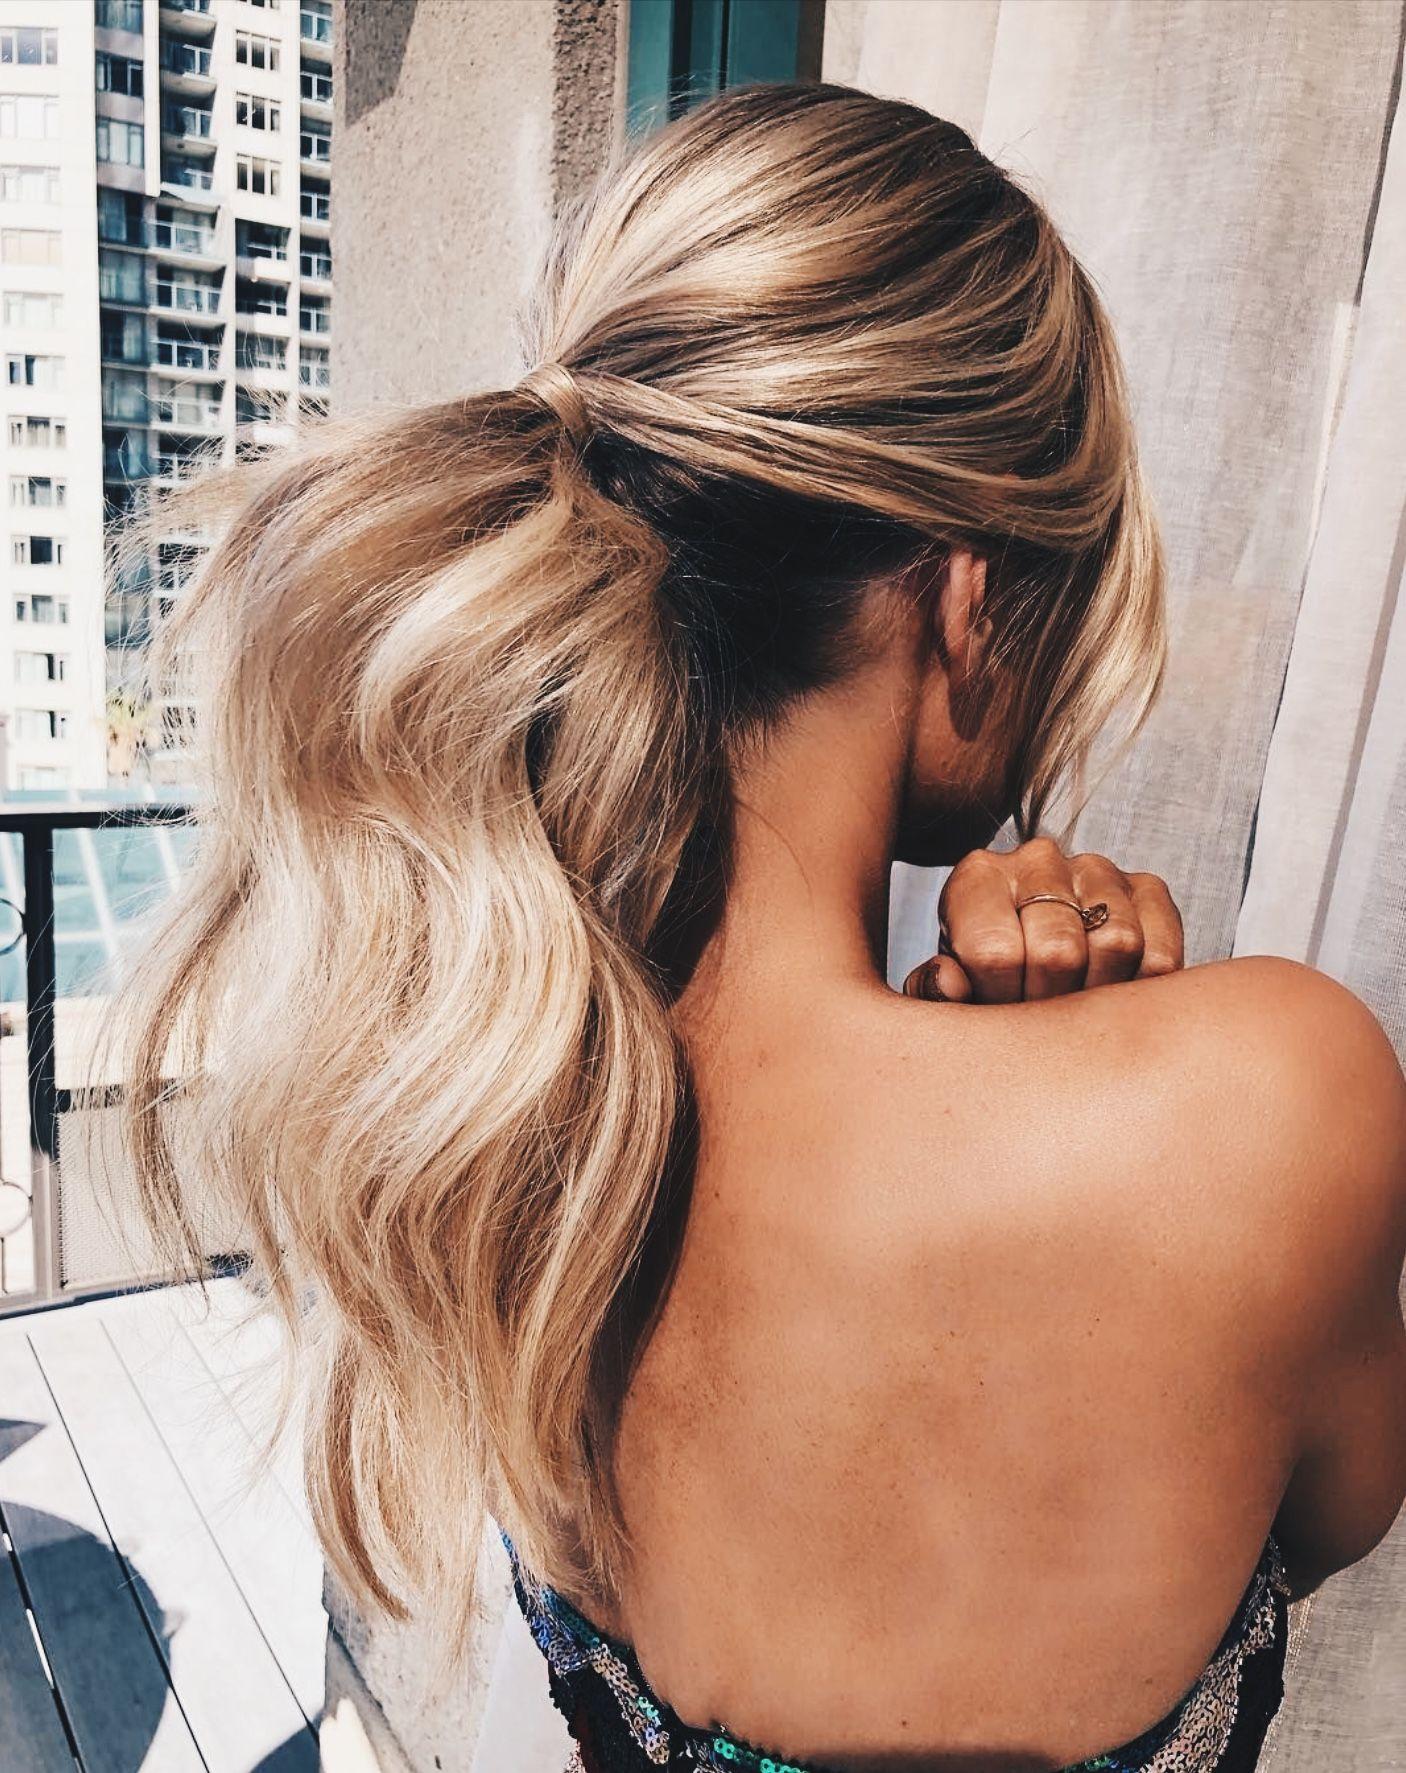 Pin by skinny jeanne on beauty hair pinterest hair style